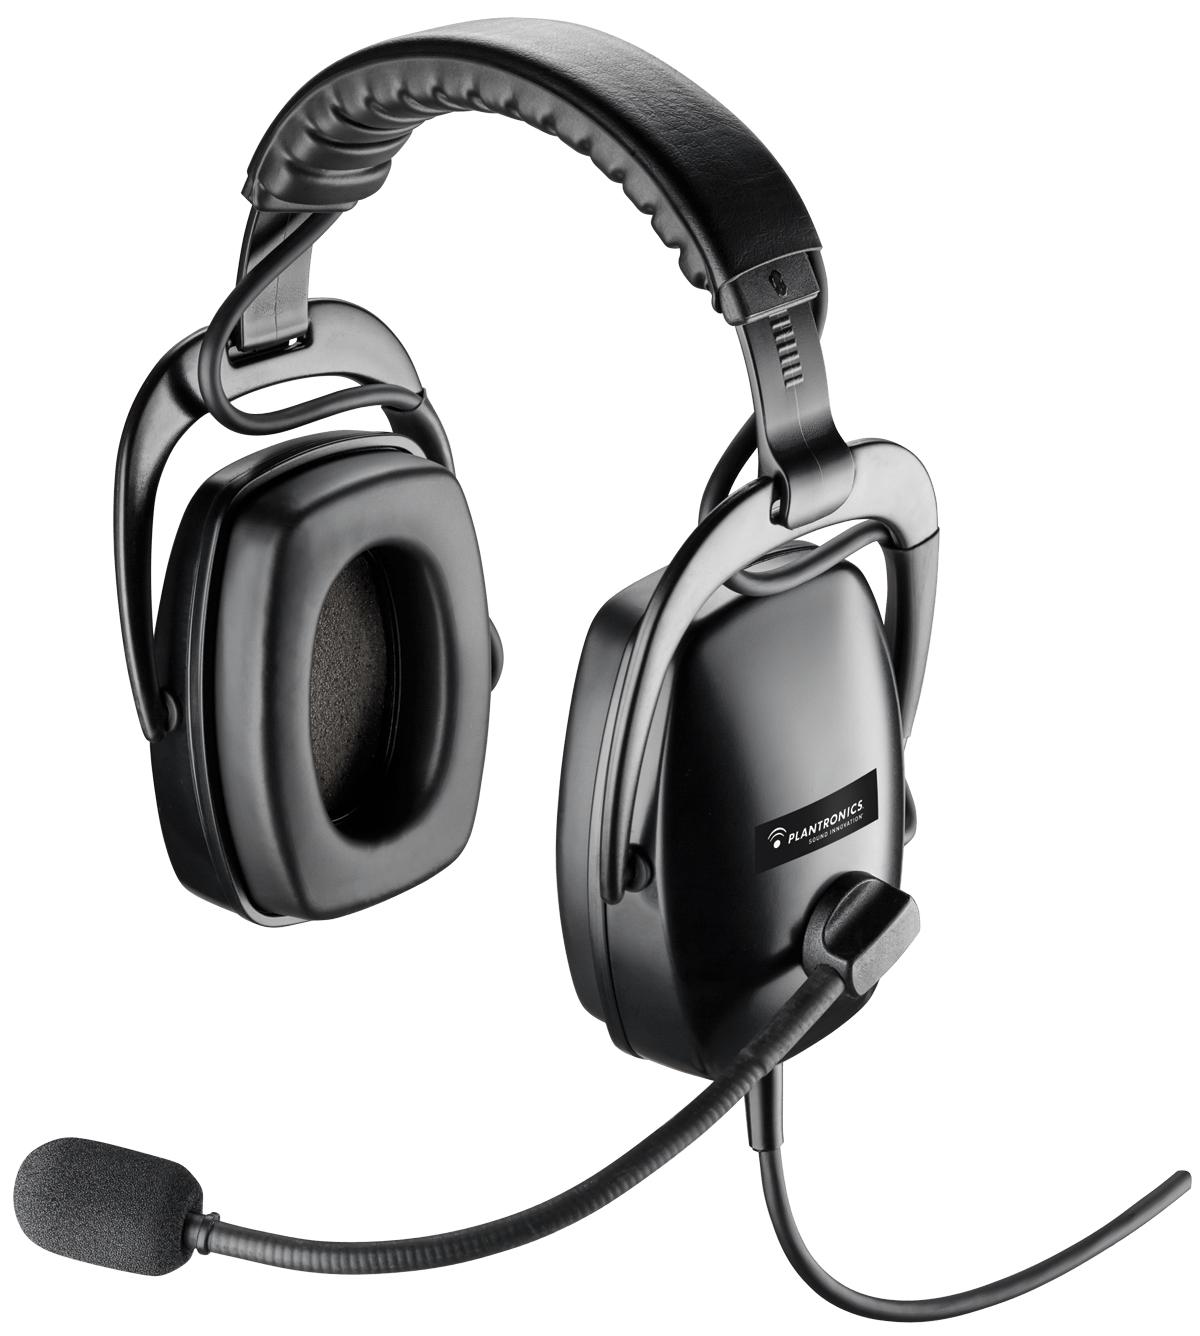 Plantronics SHR2301 01 Binaural Head-band Black headset